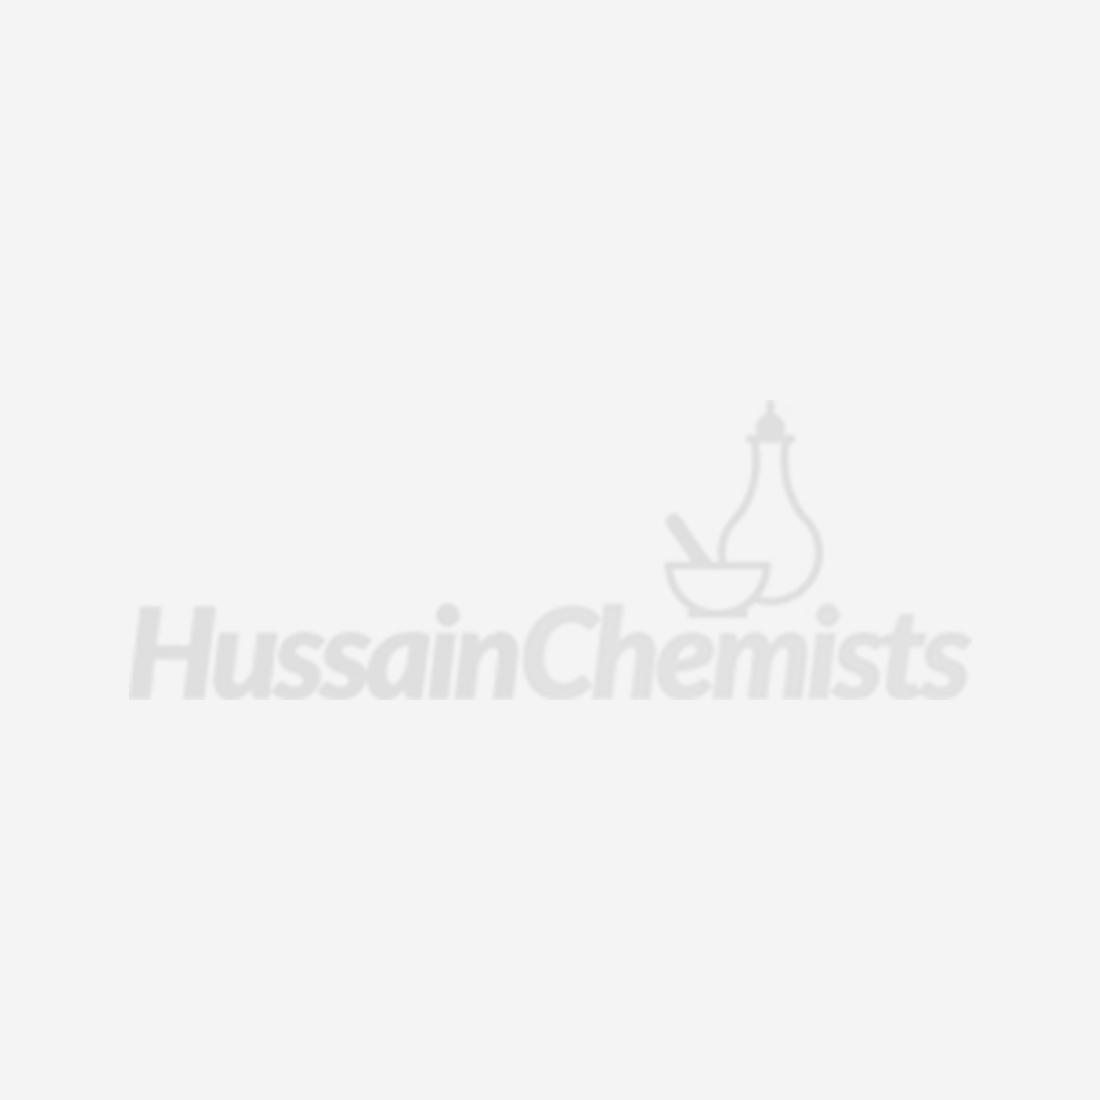 BIO KULT ADVANCED MULTI-STRAIN FORMULA 60 CAPSULES